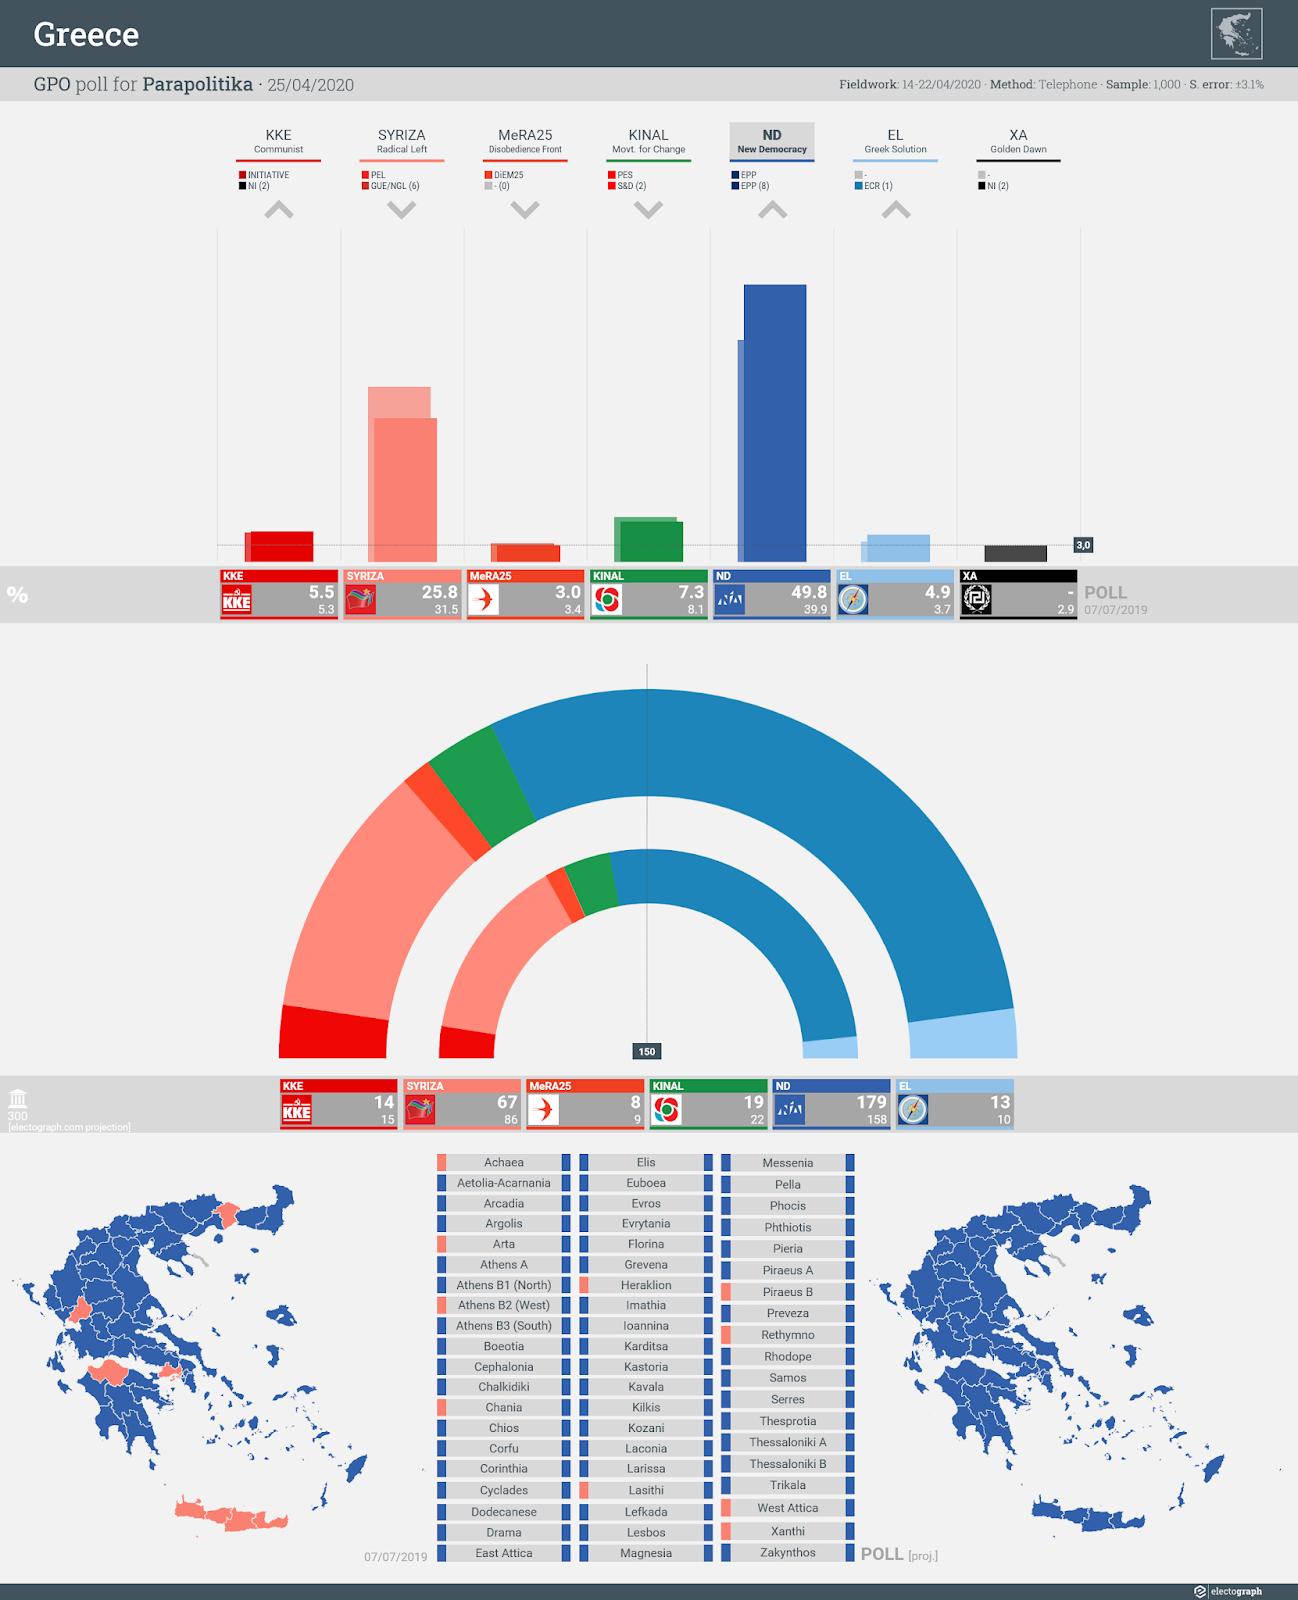 GREECE: GPO poll chart for Parapolitika, 25 April 2020